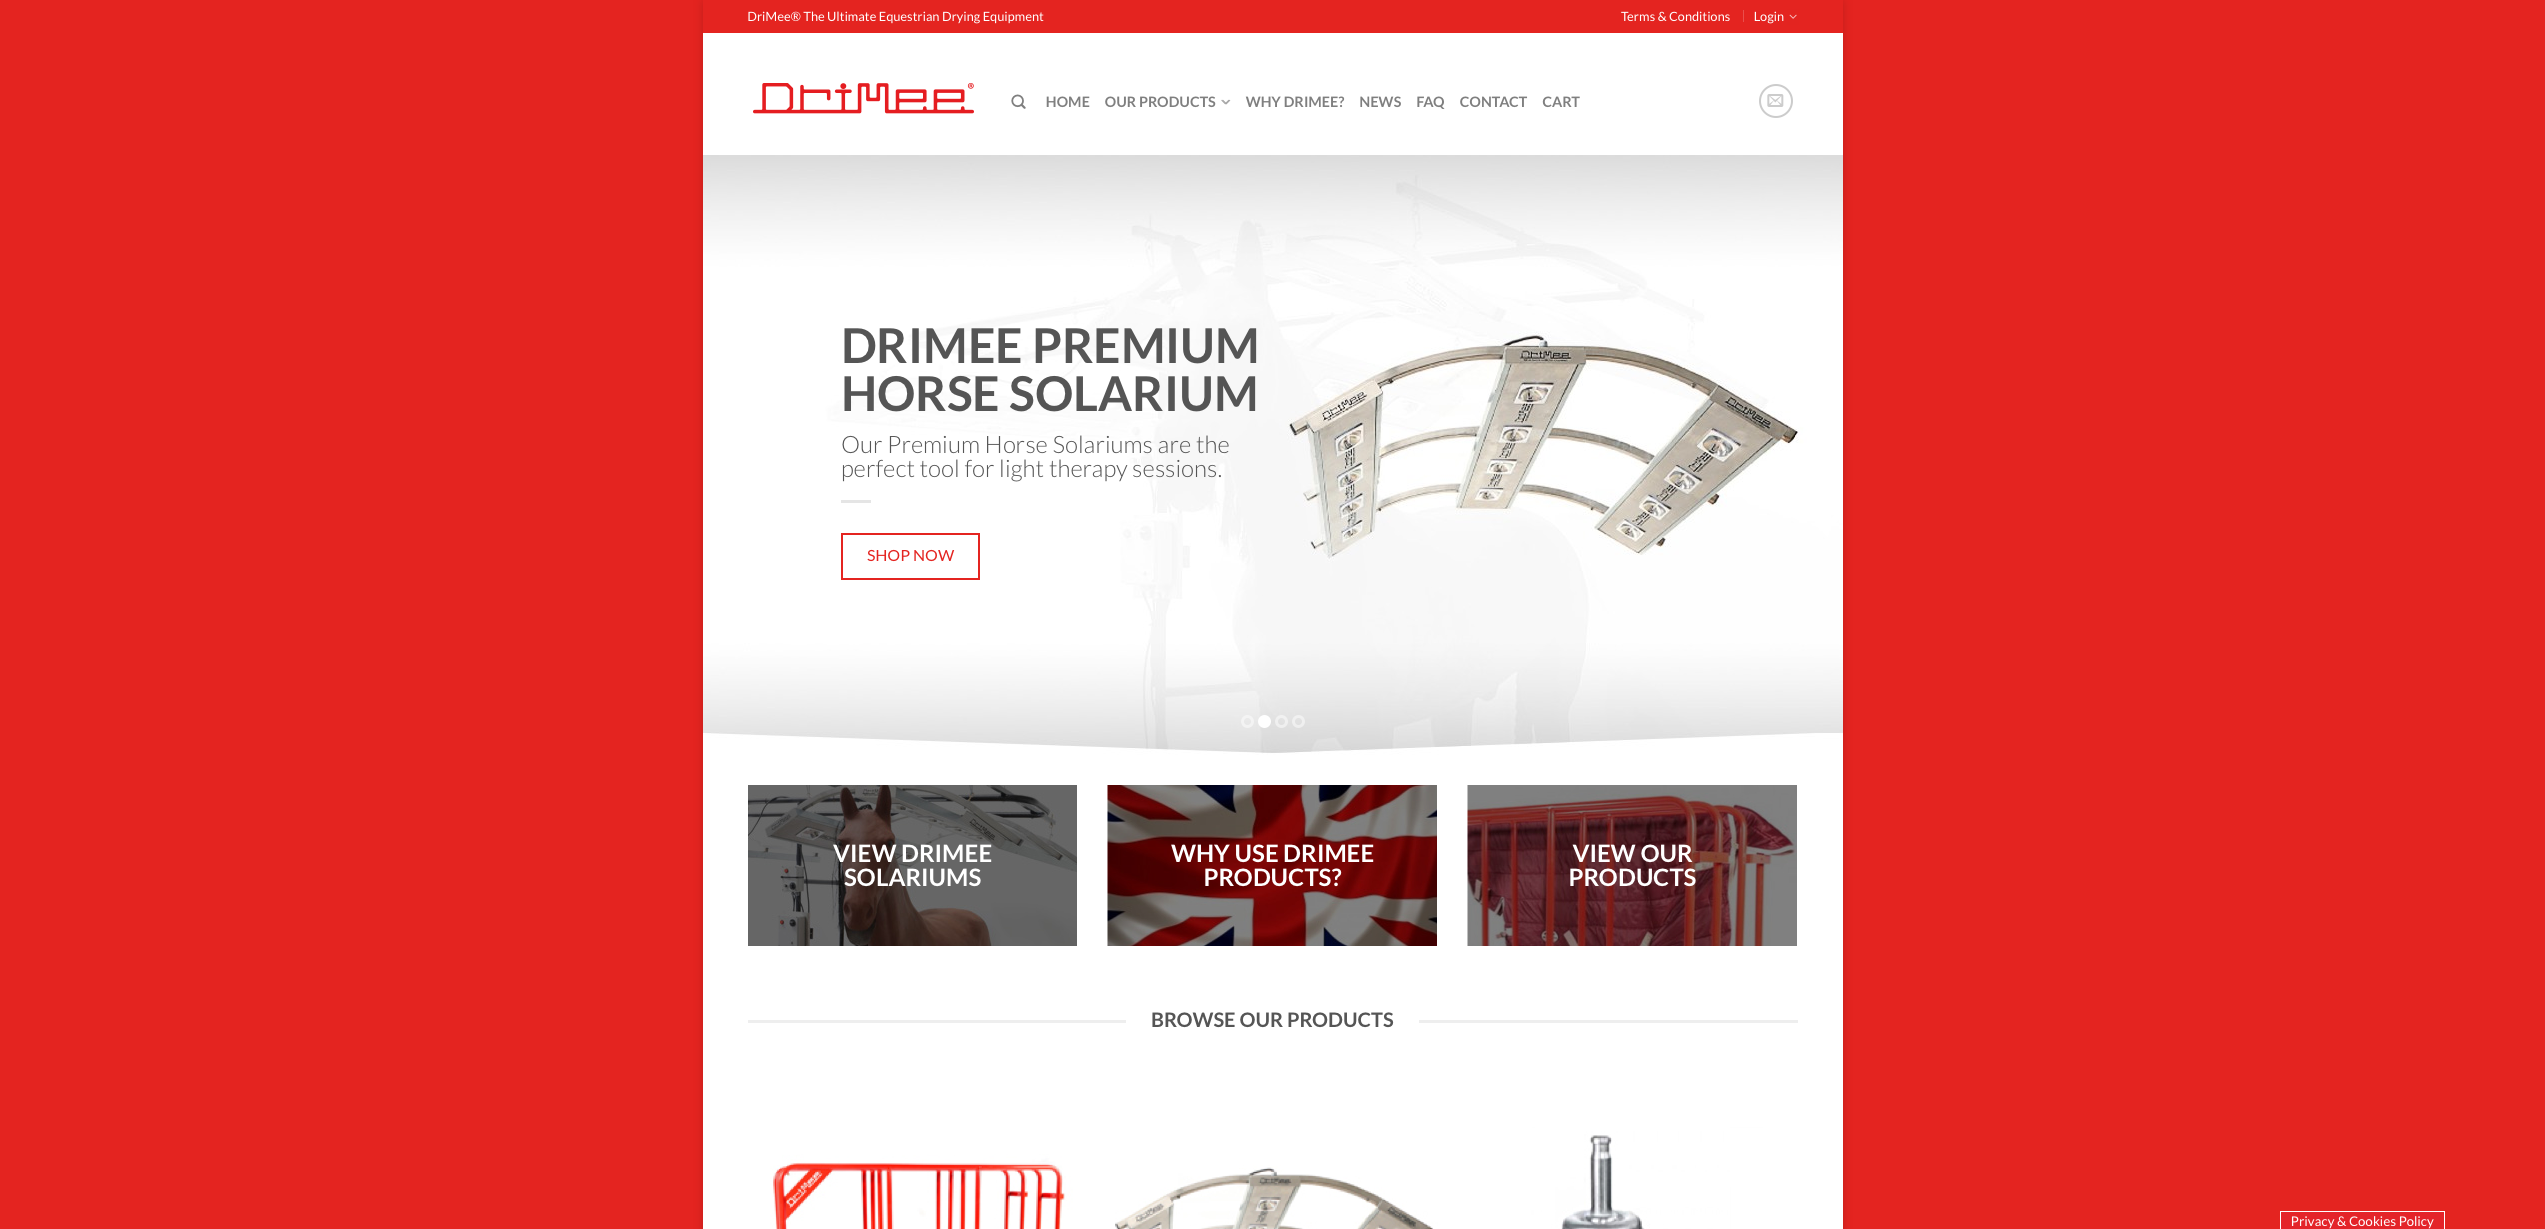 IDEA UK Design and Marketing Drimee Equestrian Horse Equipment Website Design 3